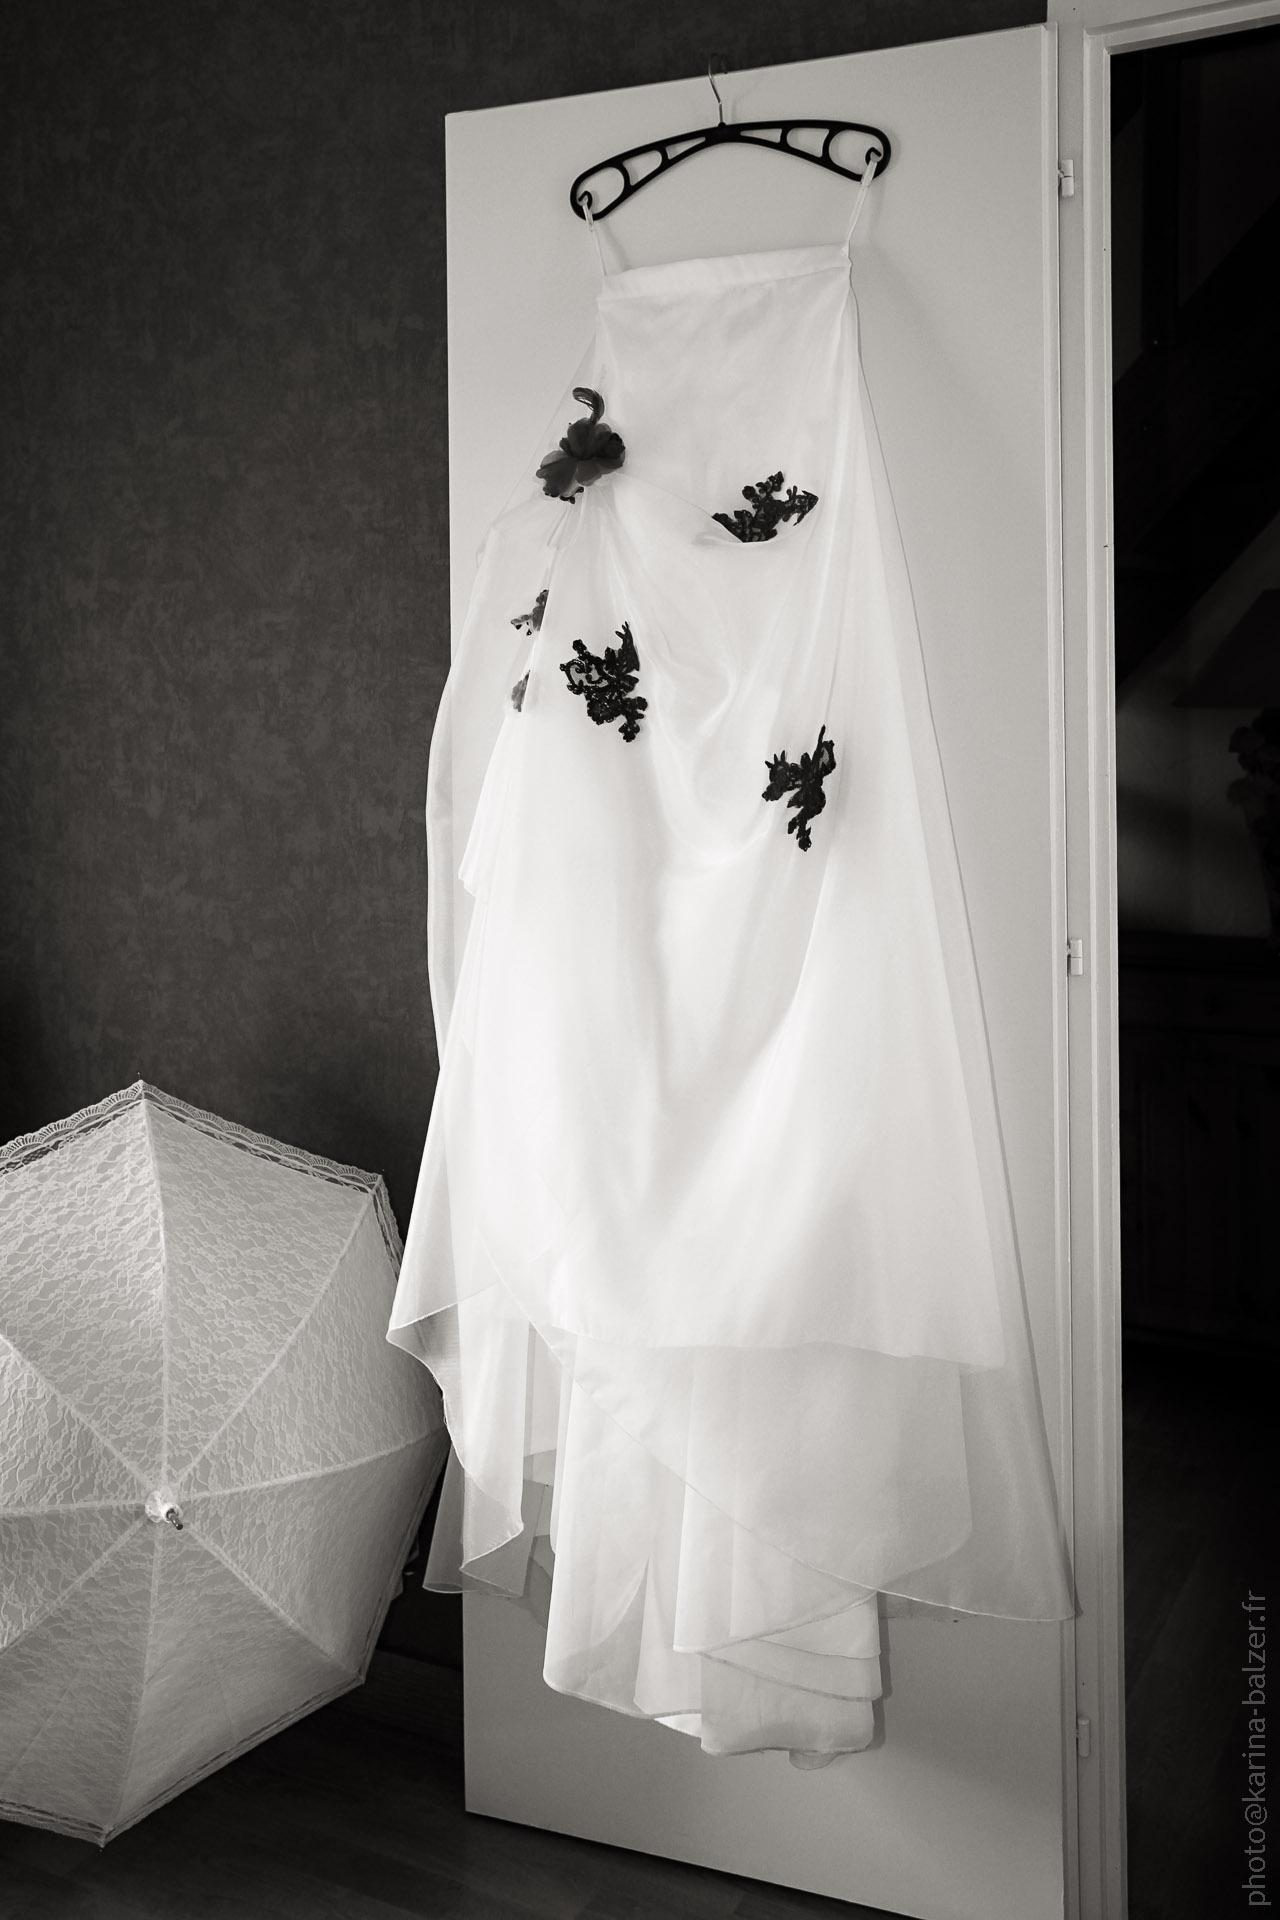 karina balzer photo de mariage noir et blanc img 0007sep karina balzer. Black Bedroom Furniture Sets. Home Design Ideas